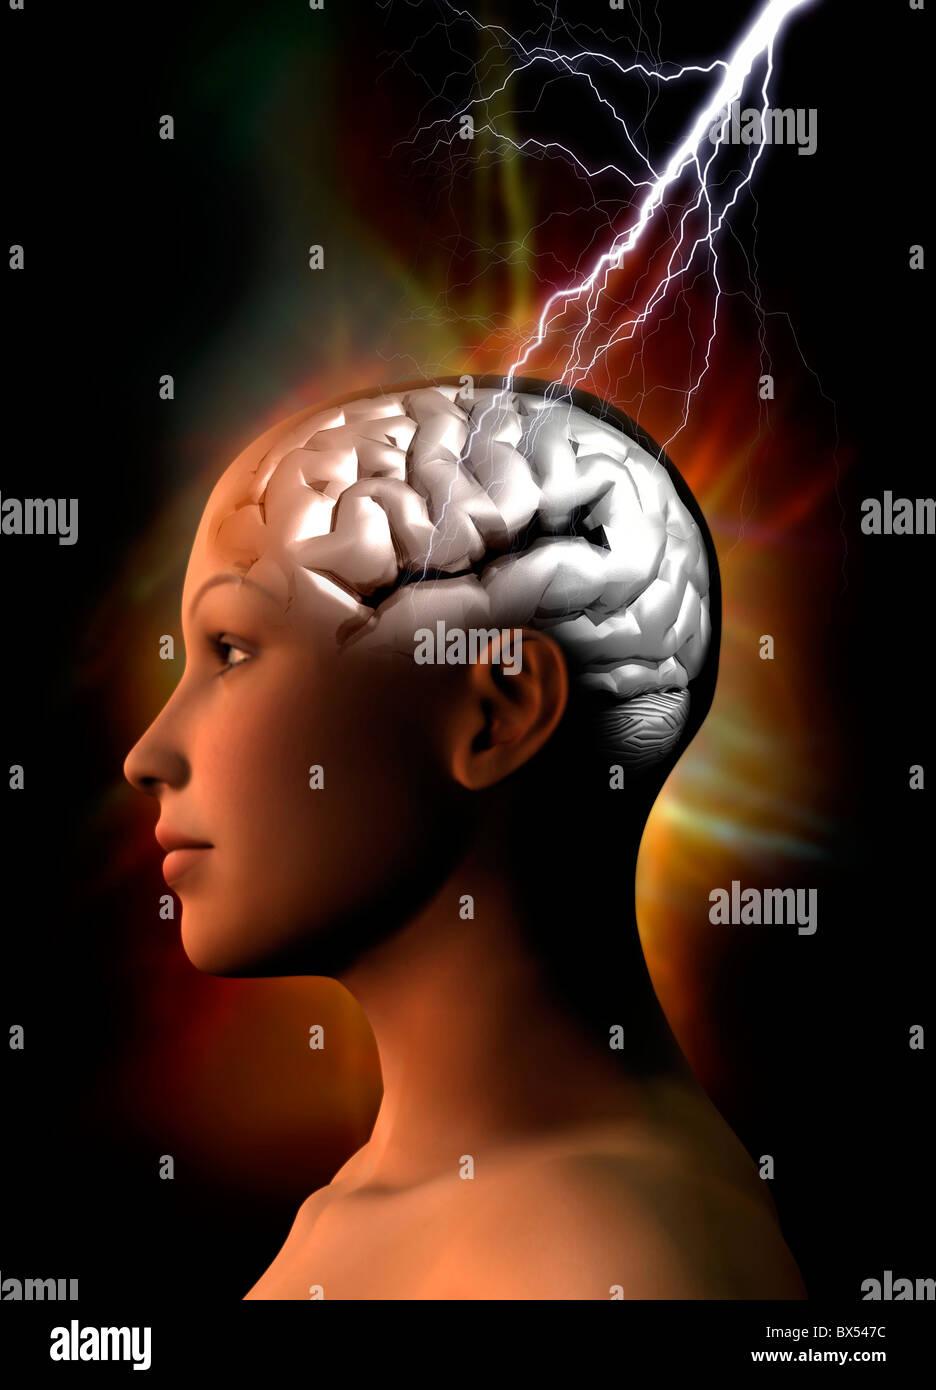 Migraine, conceptual artwork - Stock Image